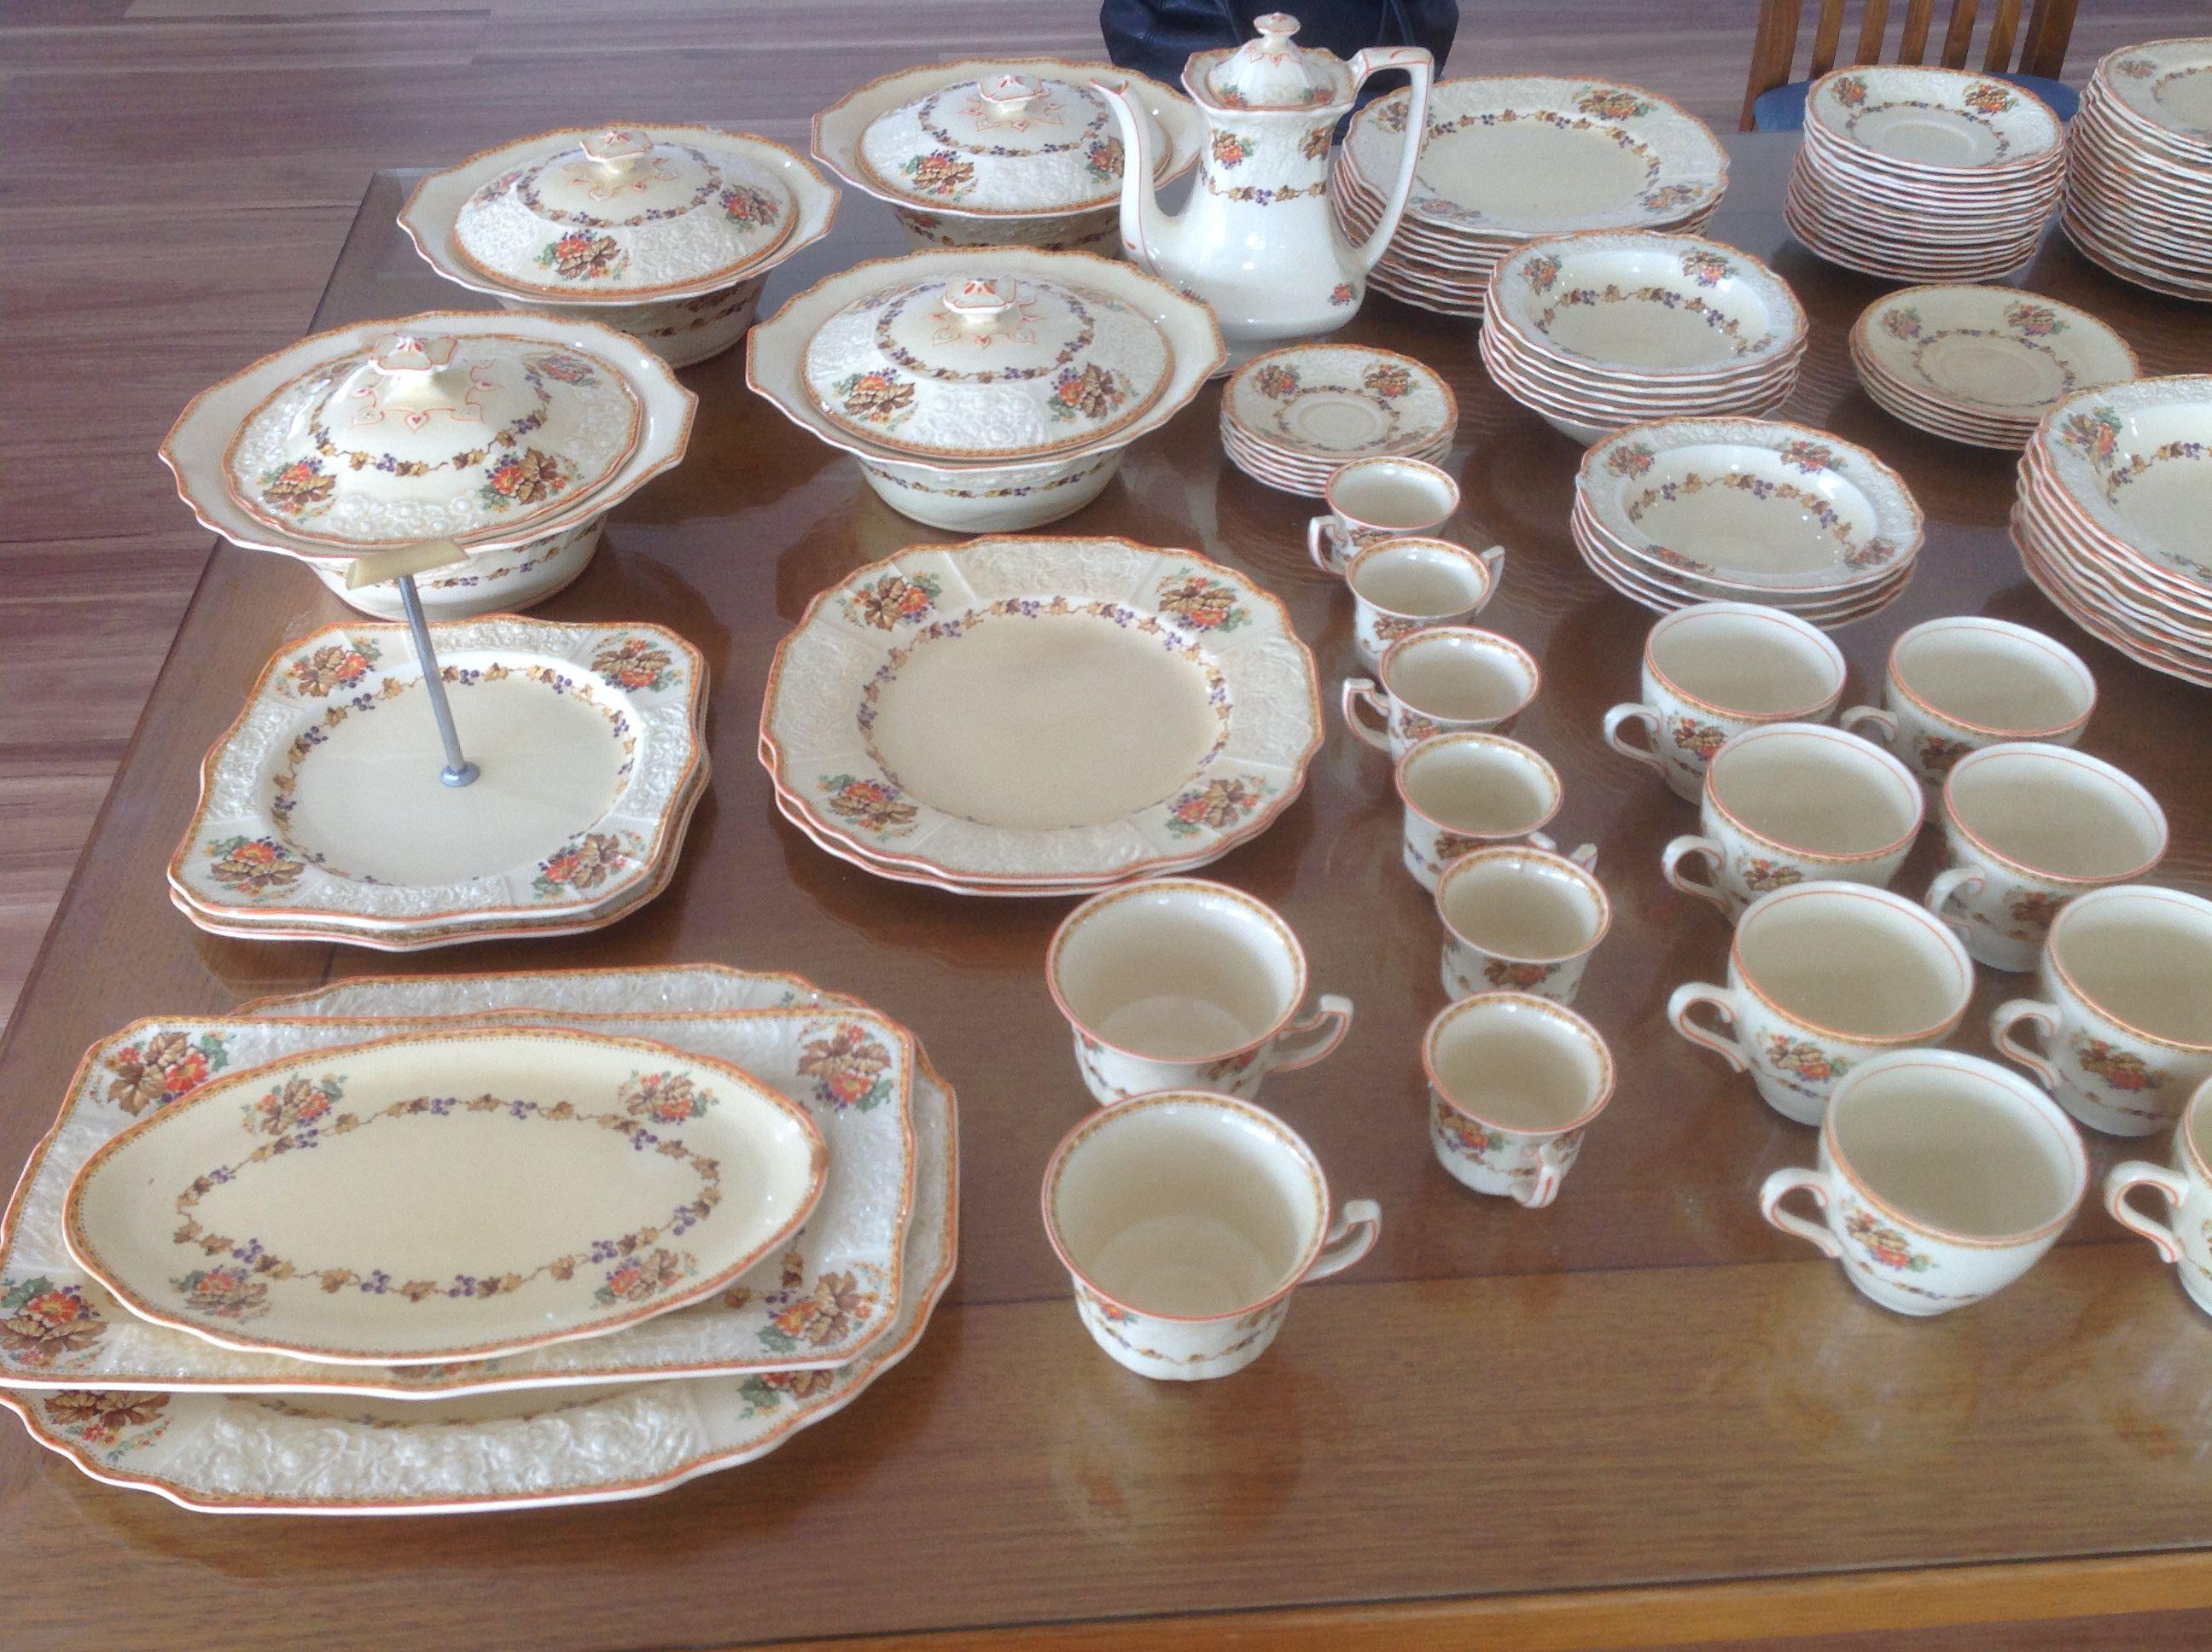 My Collection Of Grandma S Dinner Set Dinner Sets Dinnerware